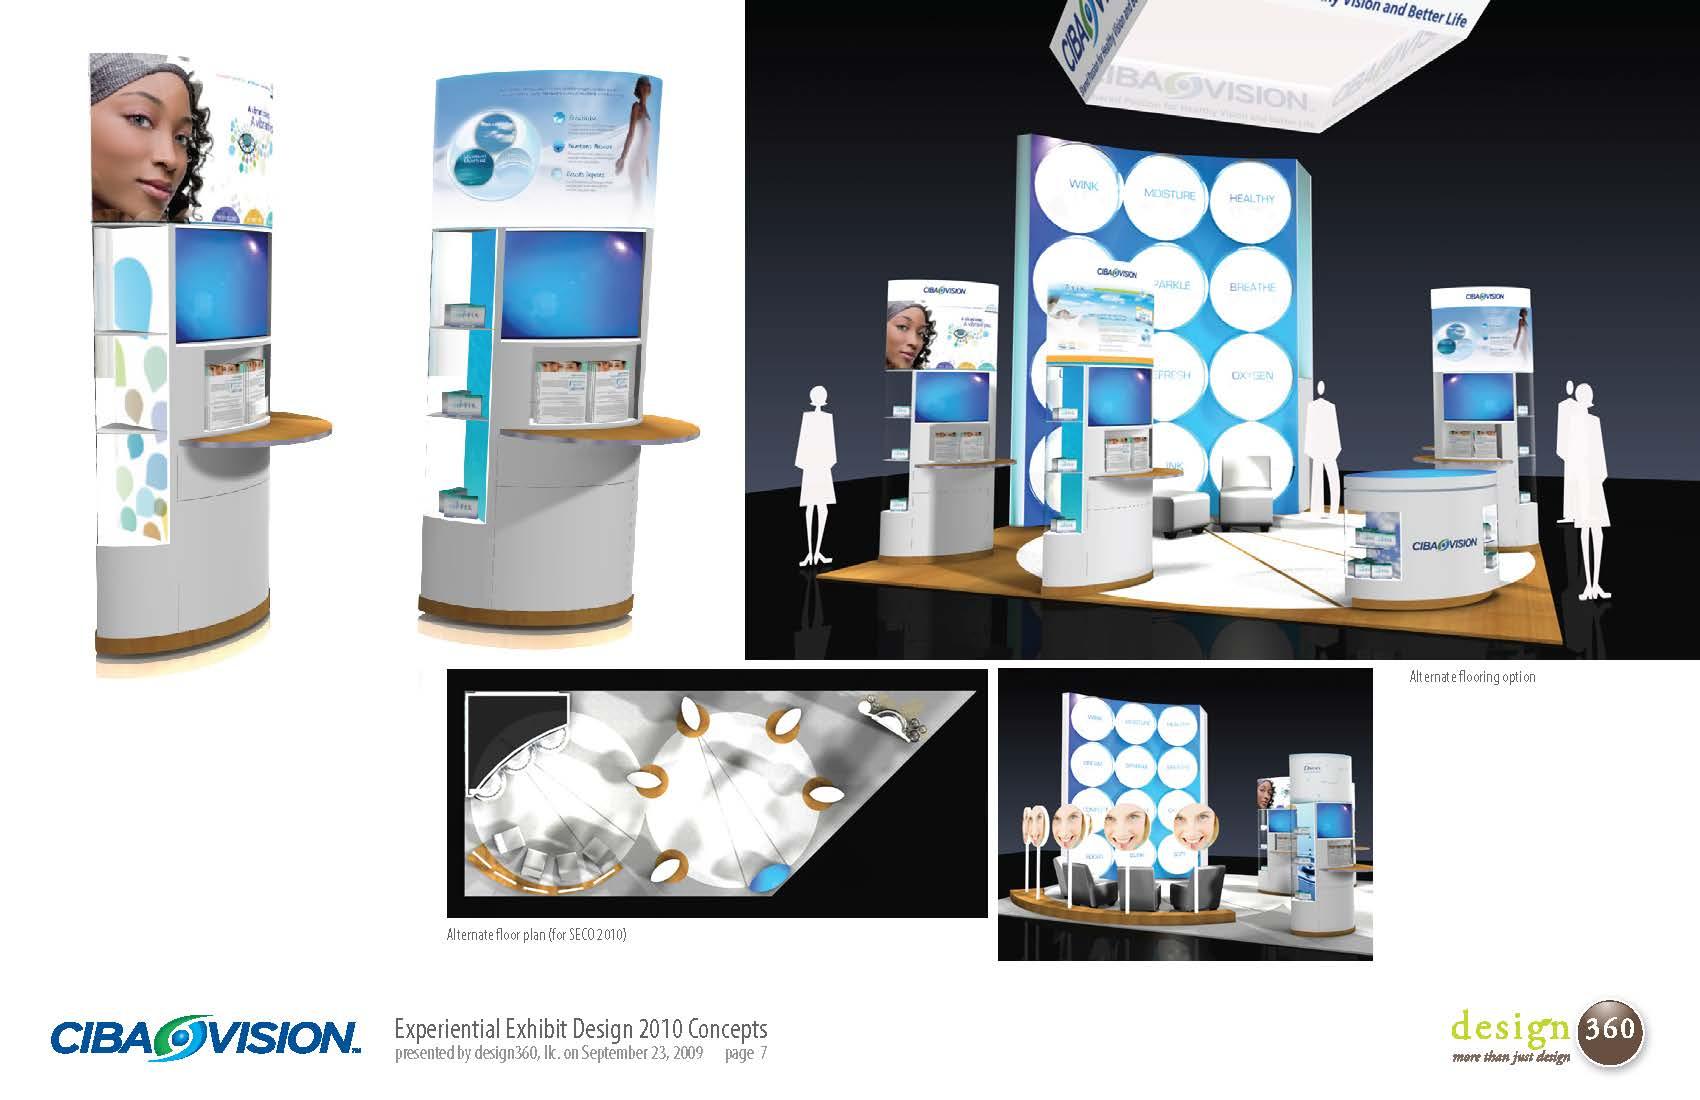 design360_cibavision_page_7.jpg